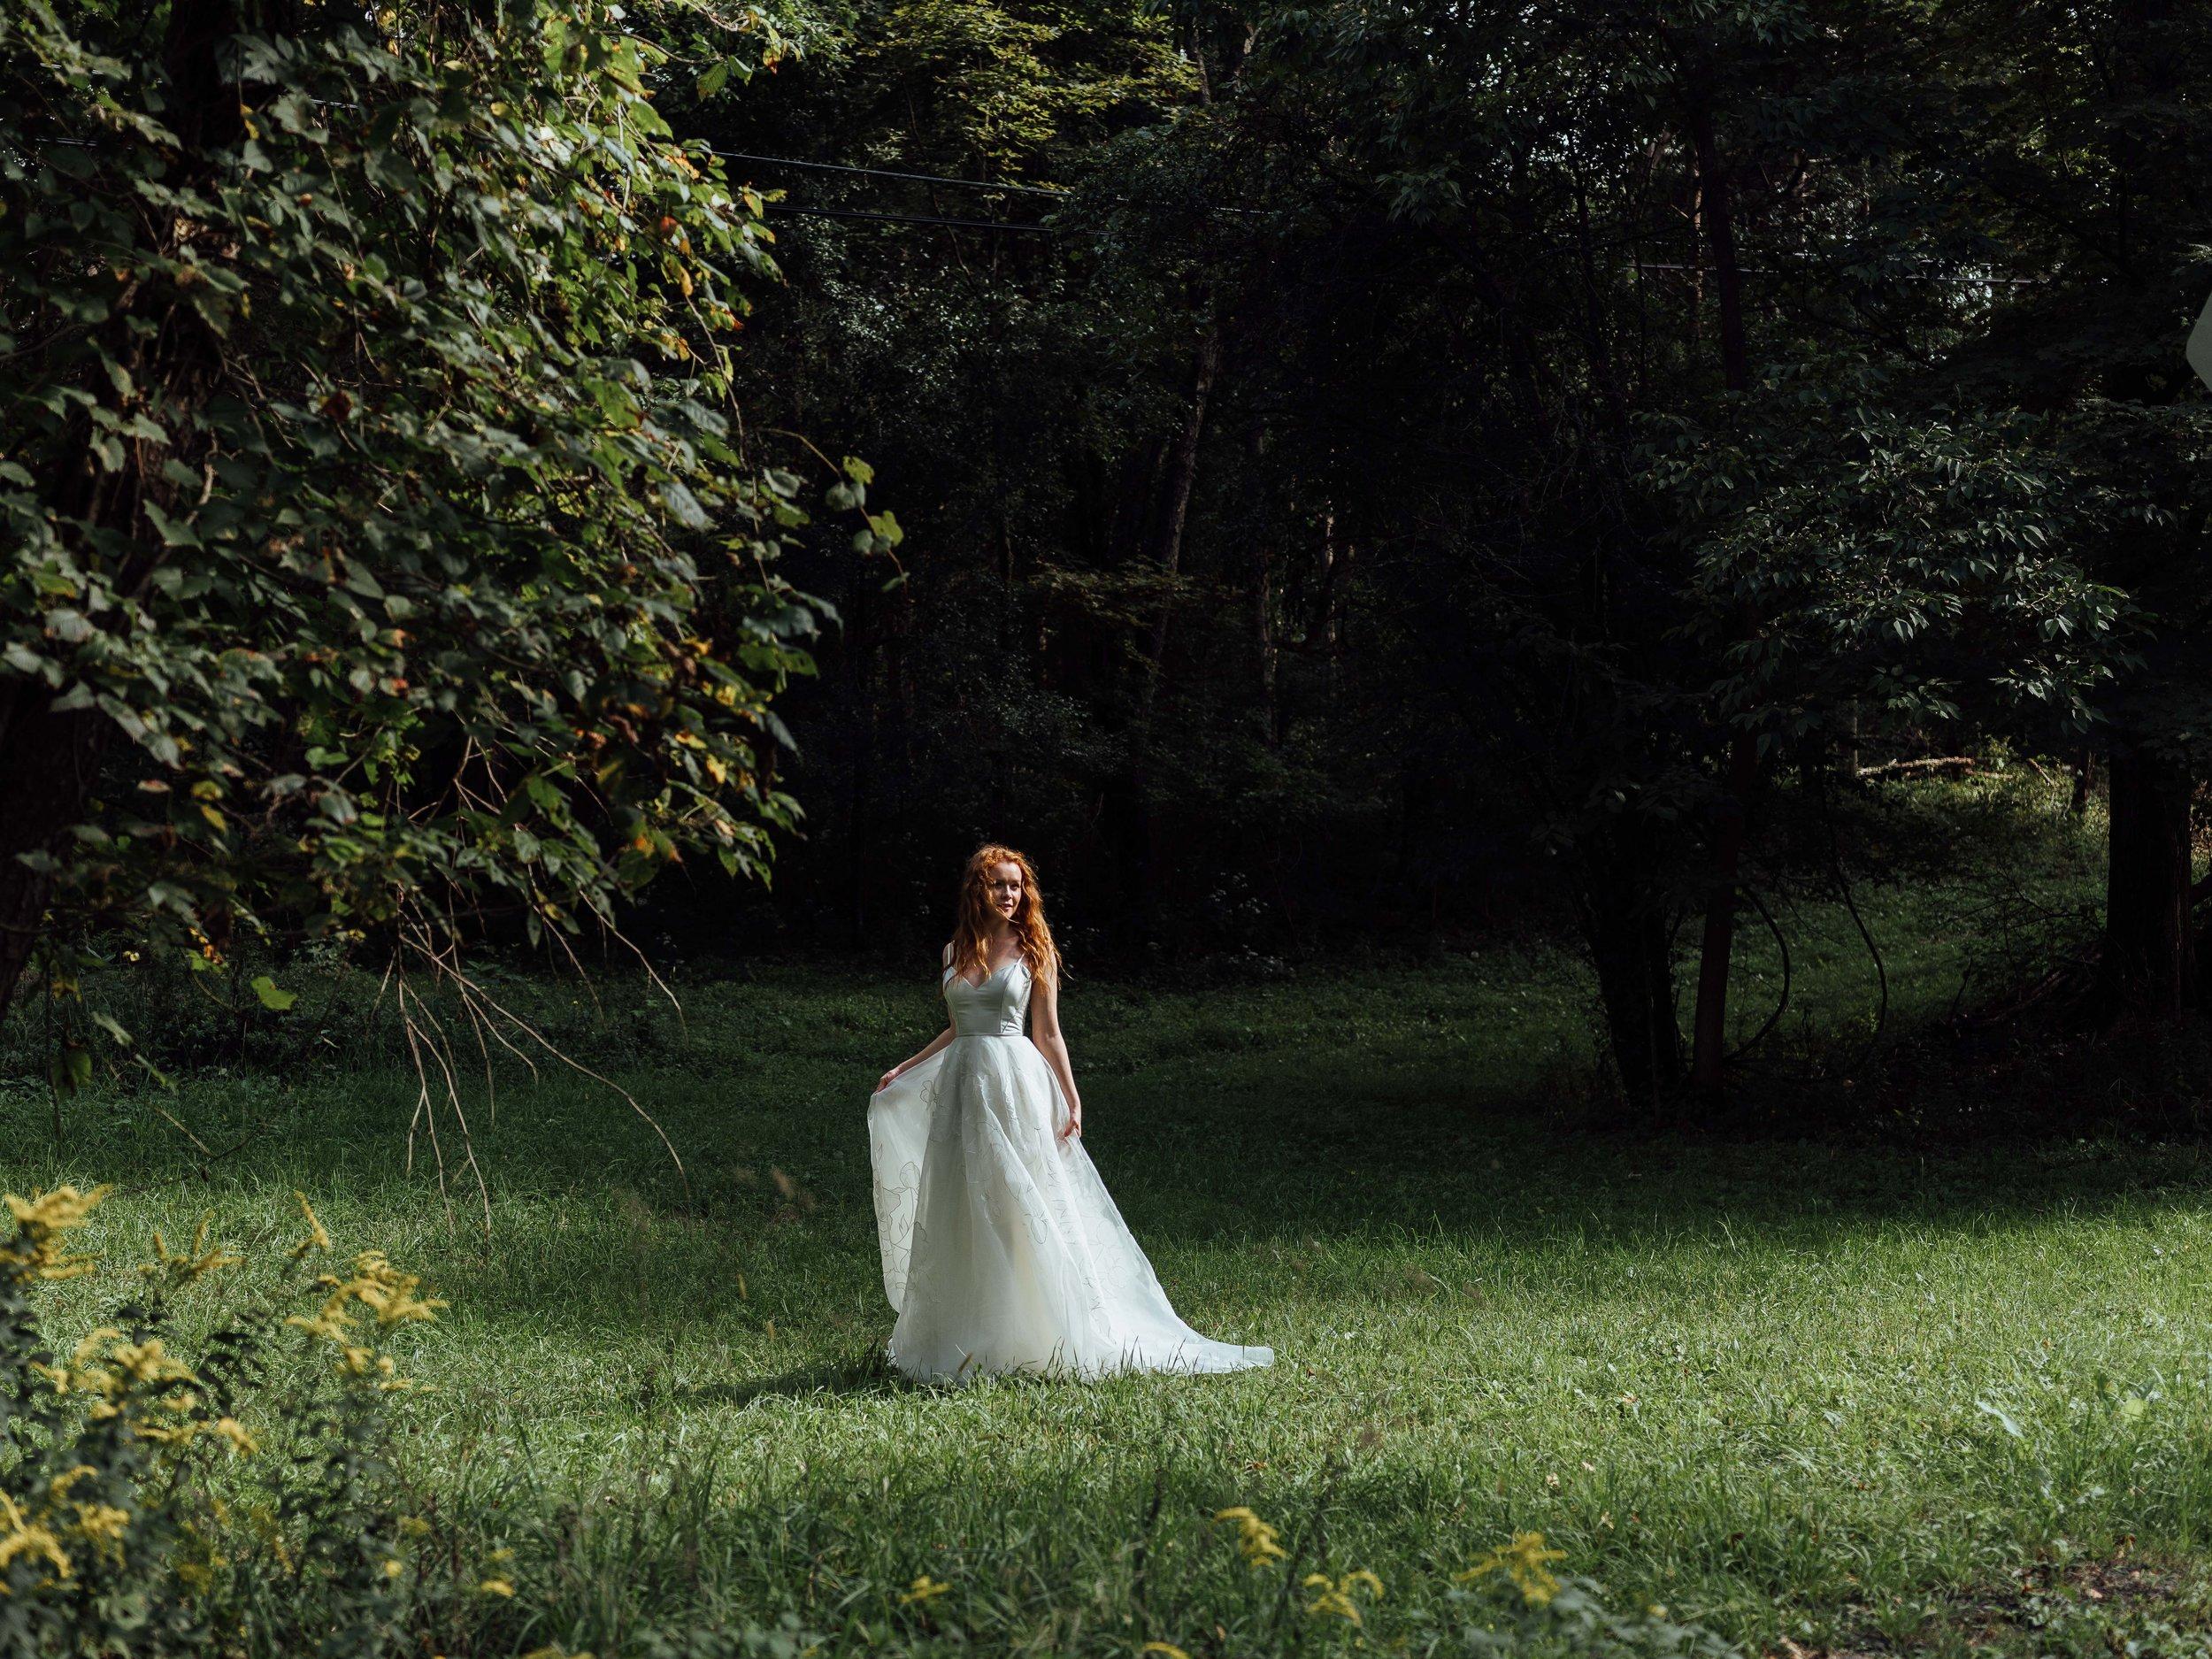 WSPCo-Gather-Greene-Rebecca-Schoneveld-Bridal-449 copy.jpg